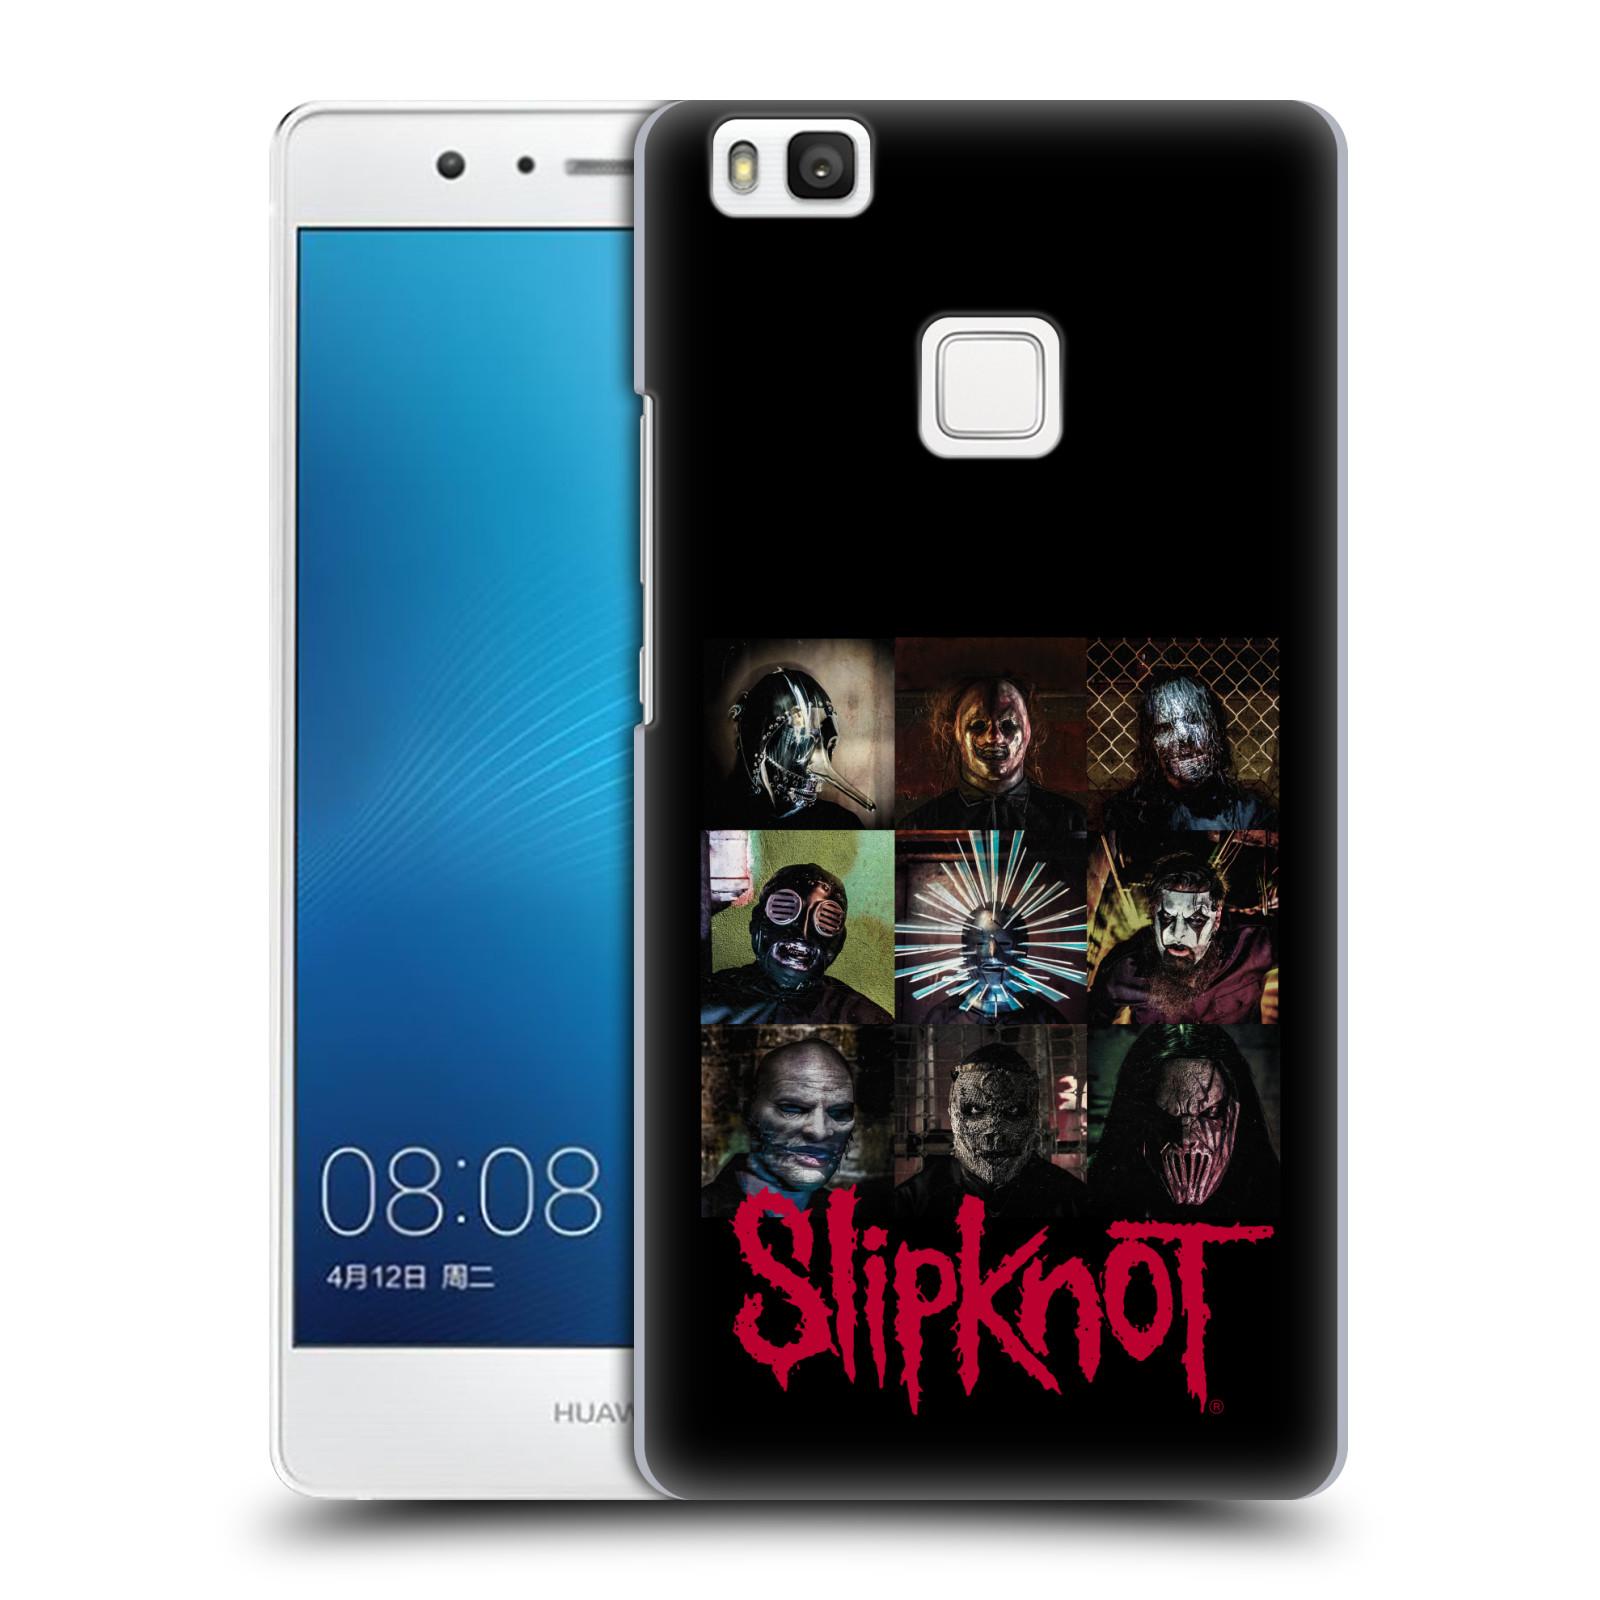 Plastové pouzdro na mobil Huawei P9 Lite HEAD CASE Slipknot - Bloky